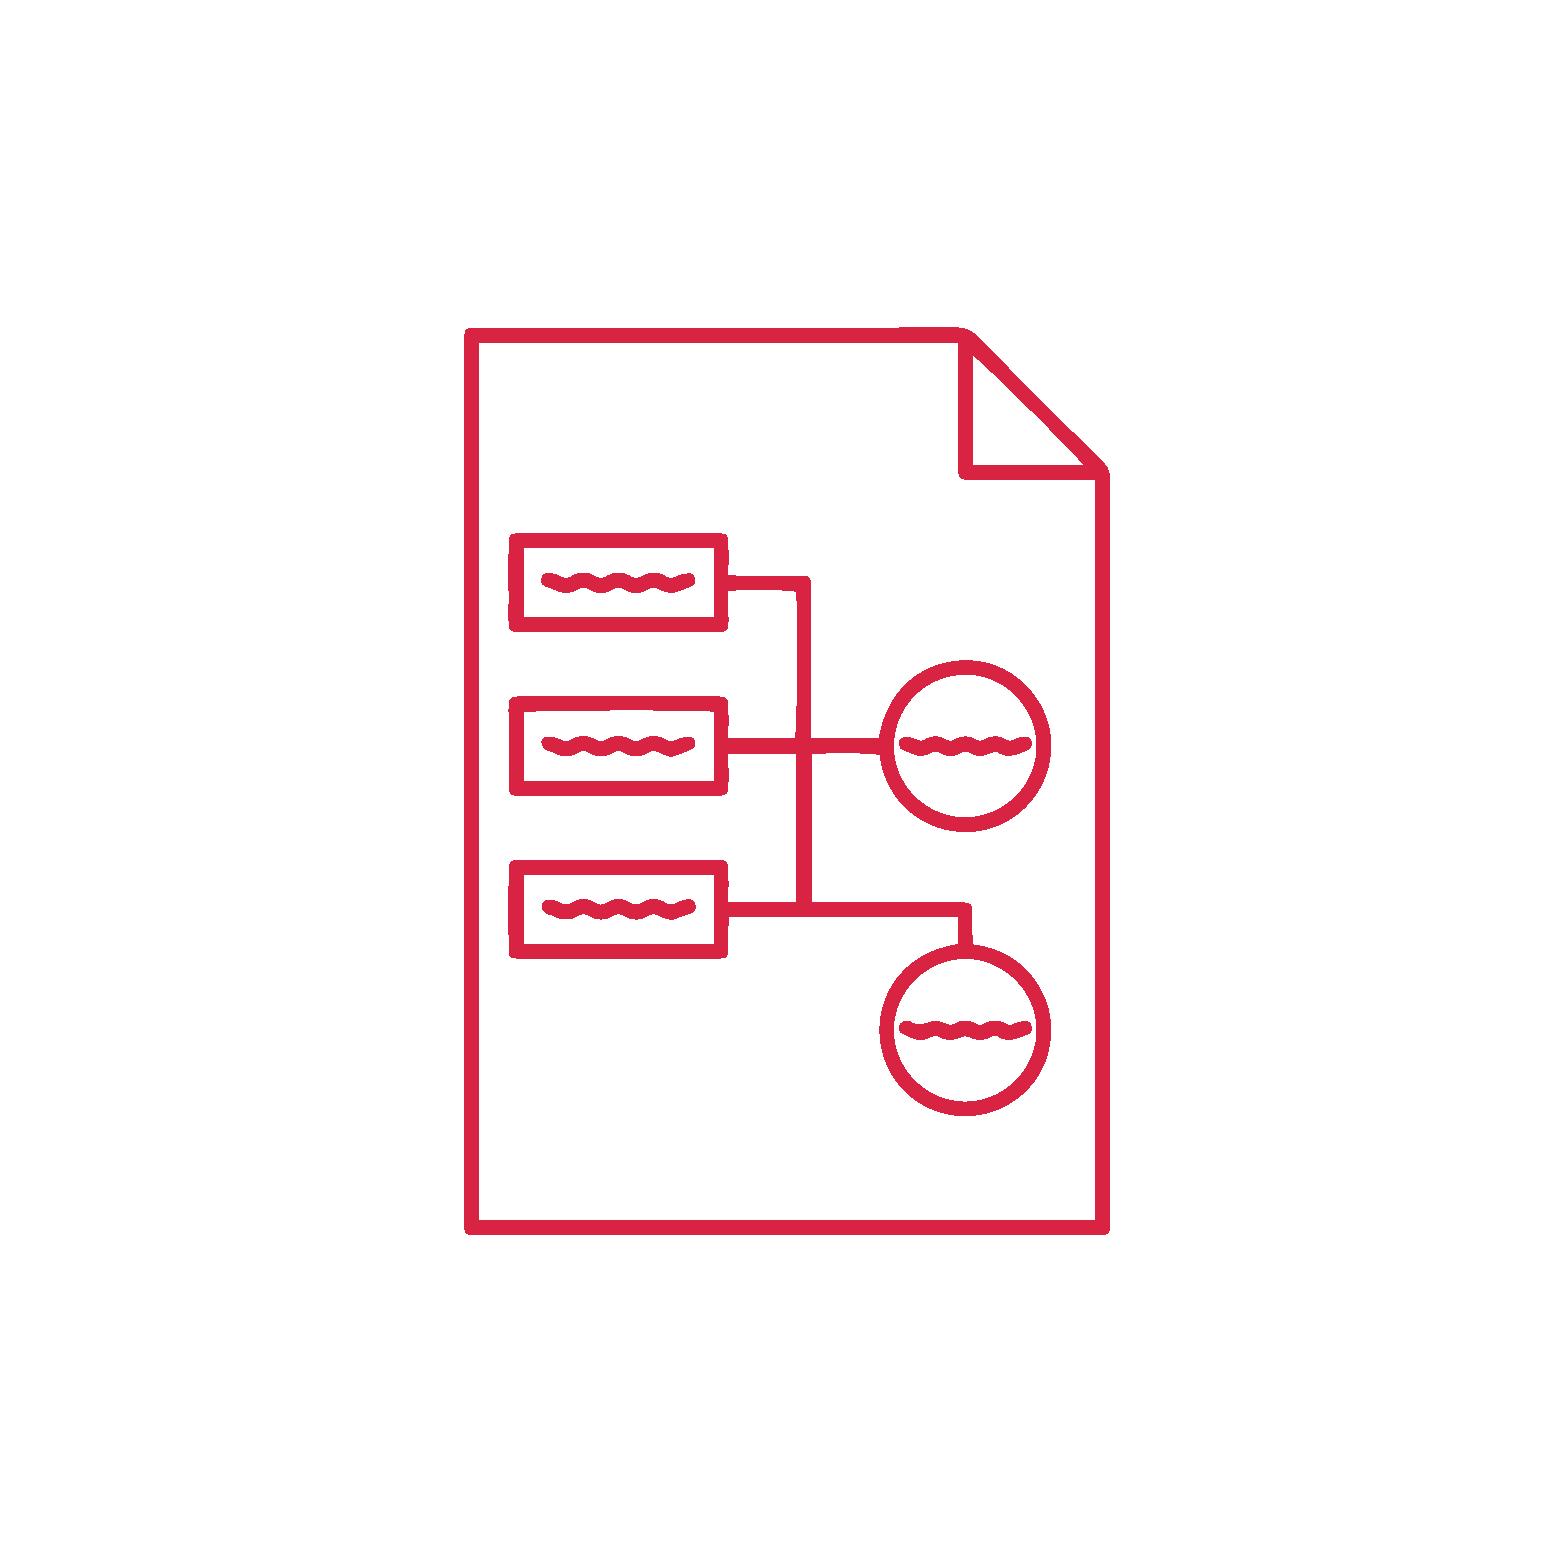 Design Sprint - Jour 1 - Comprendre icone